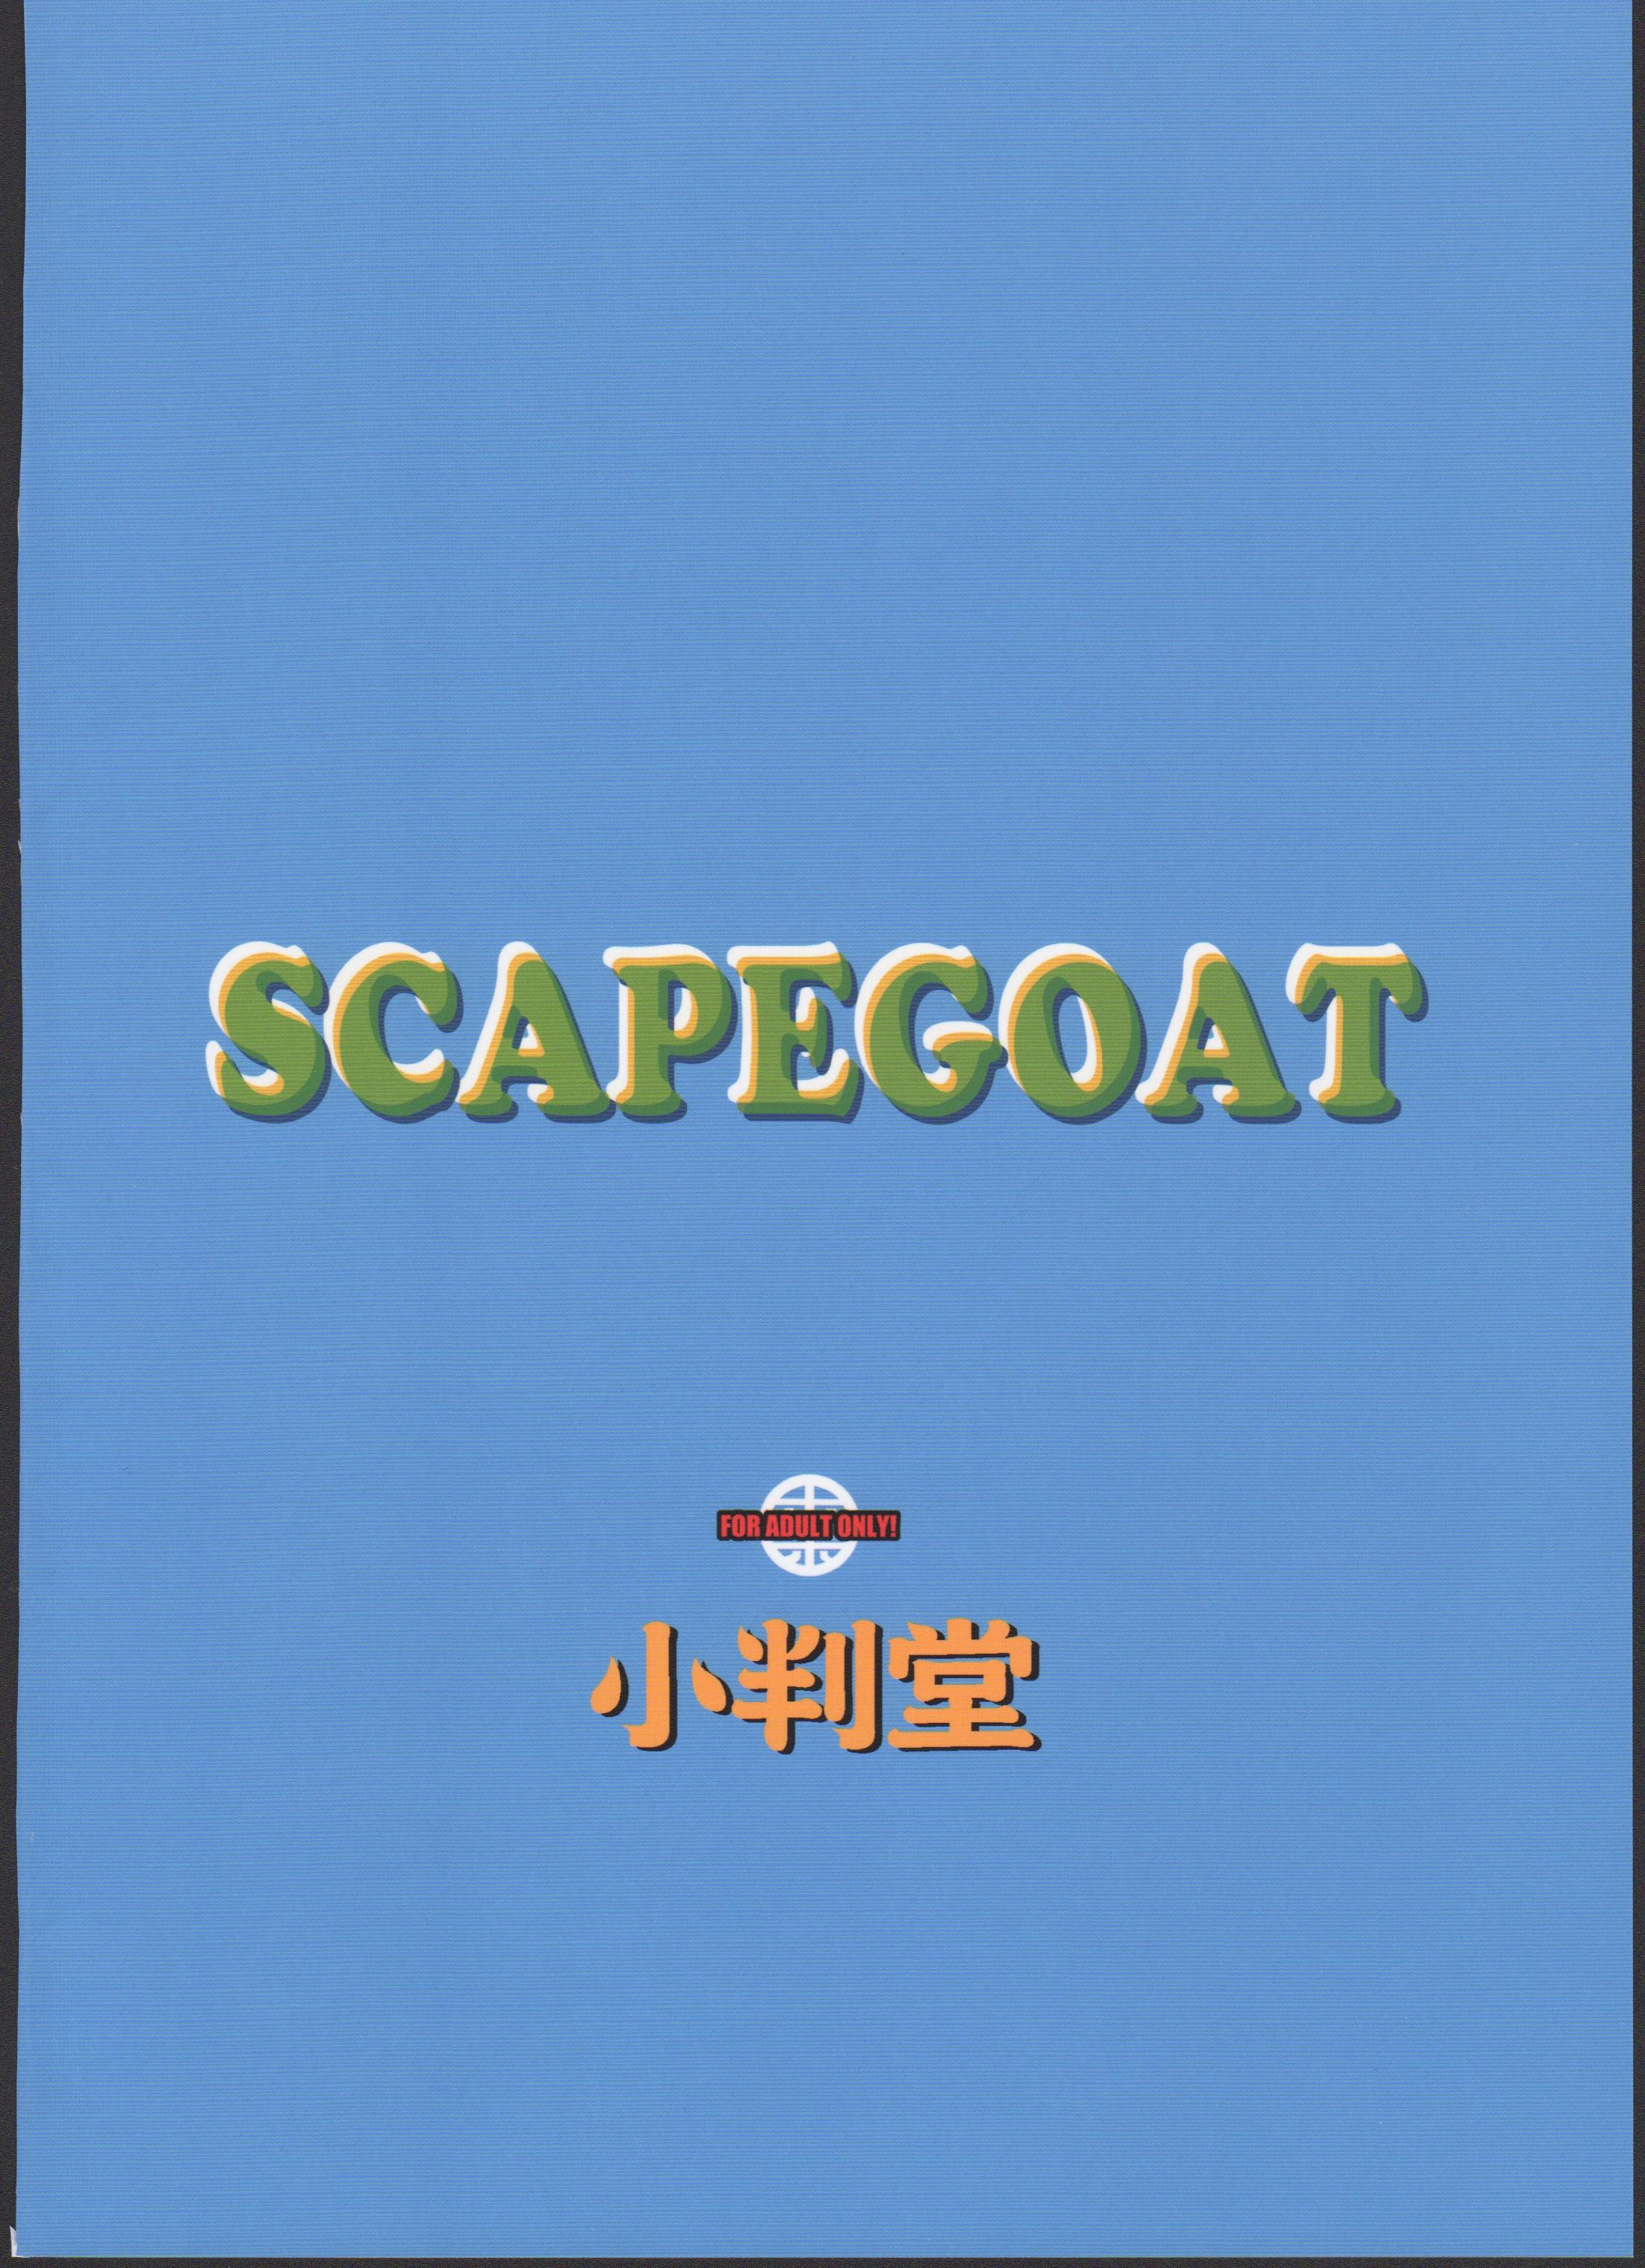 SCAPEGOAT 31